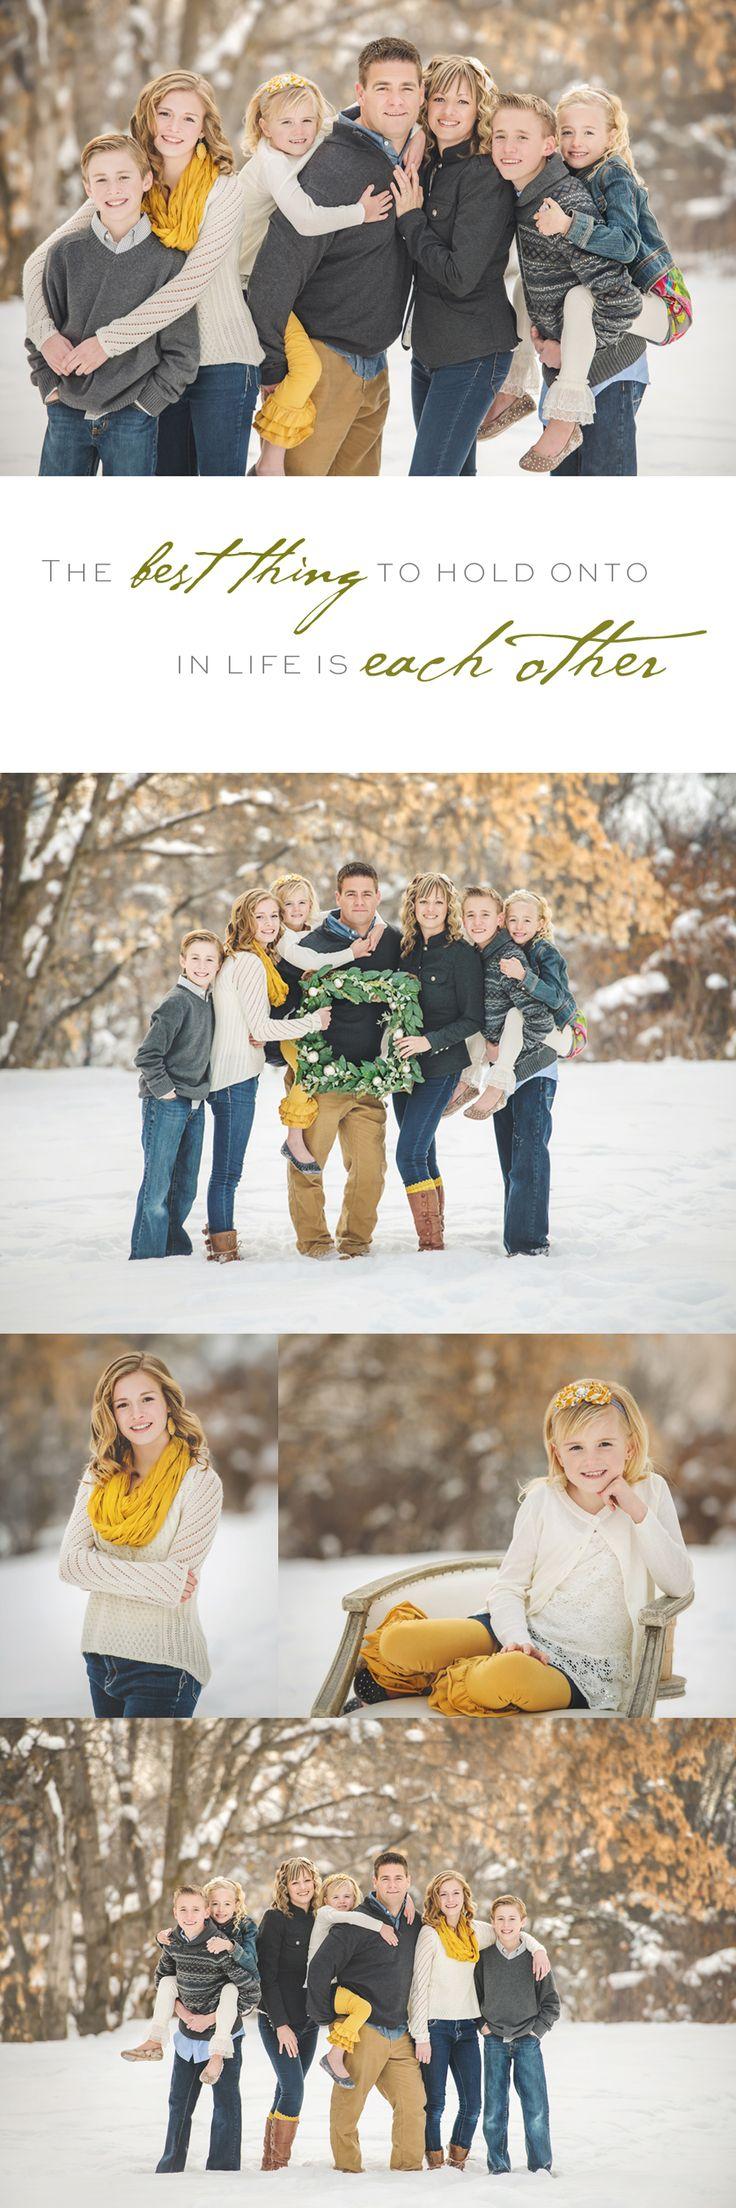 Winter family shoot, Mustard and gray, Snow photos. BIG FAMILIES